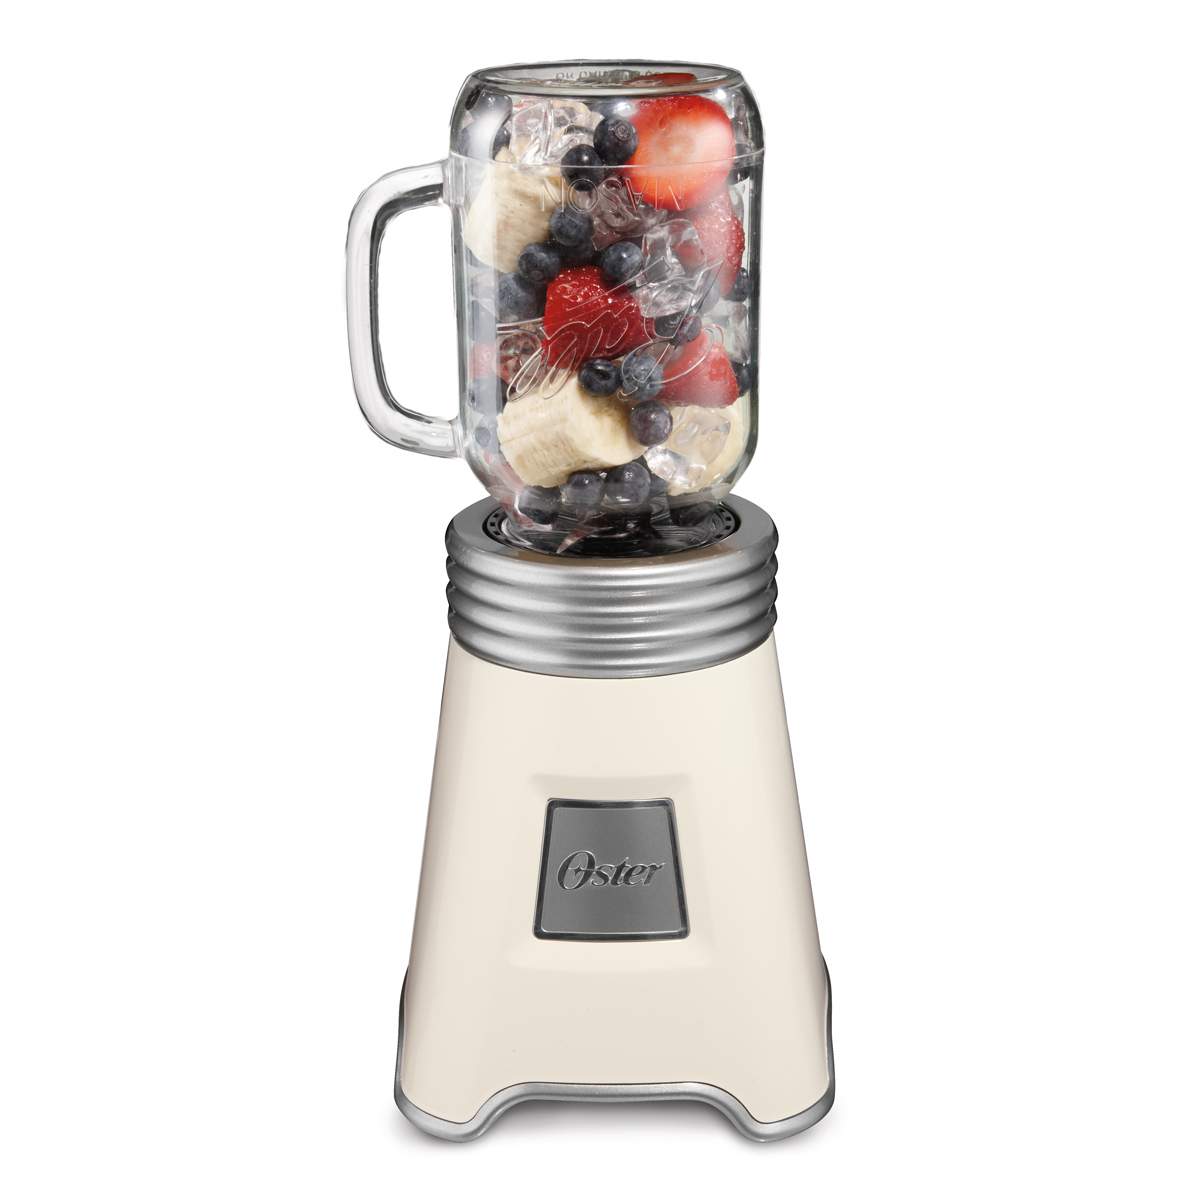 Oster Coffee Maker The Bay : Oster Fresh+Blend N Go Mason Jar Blender, White BLSTPB-BALL-W-033 Oster Canada